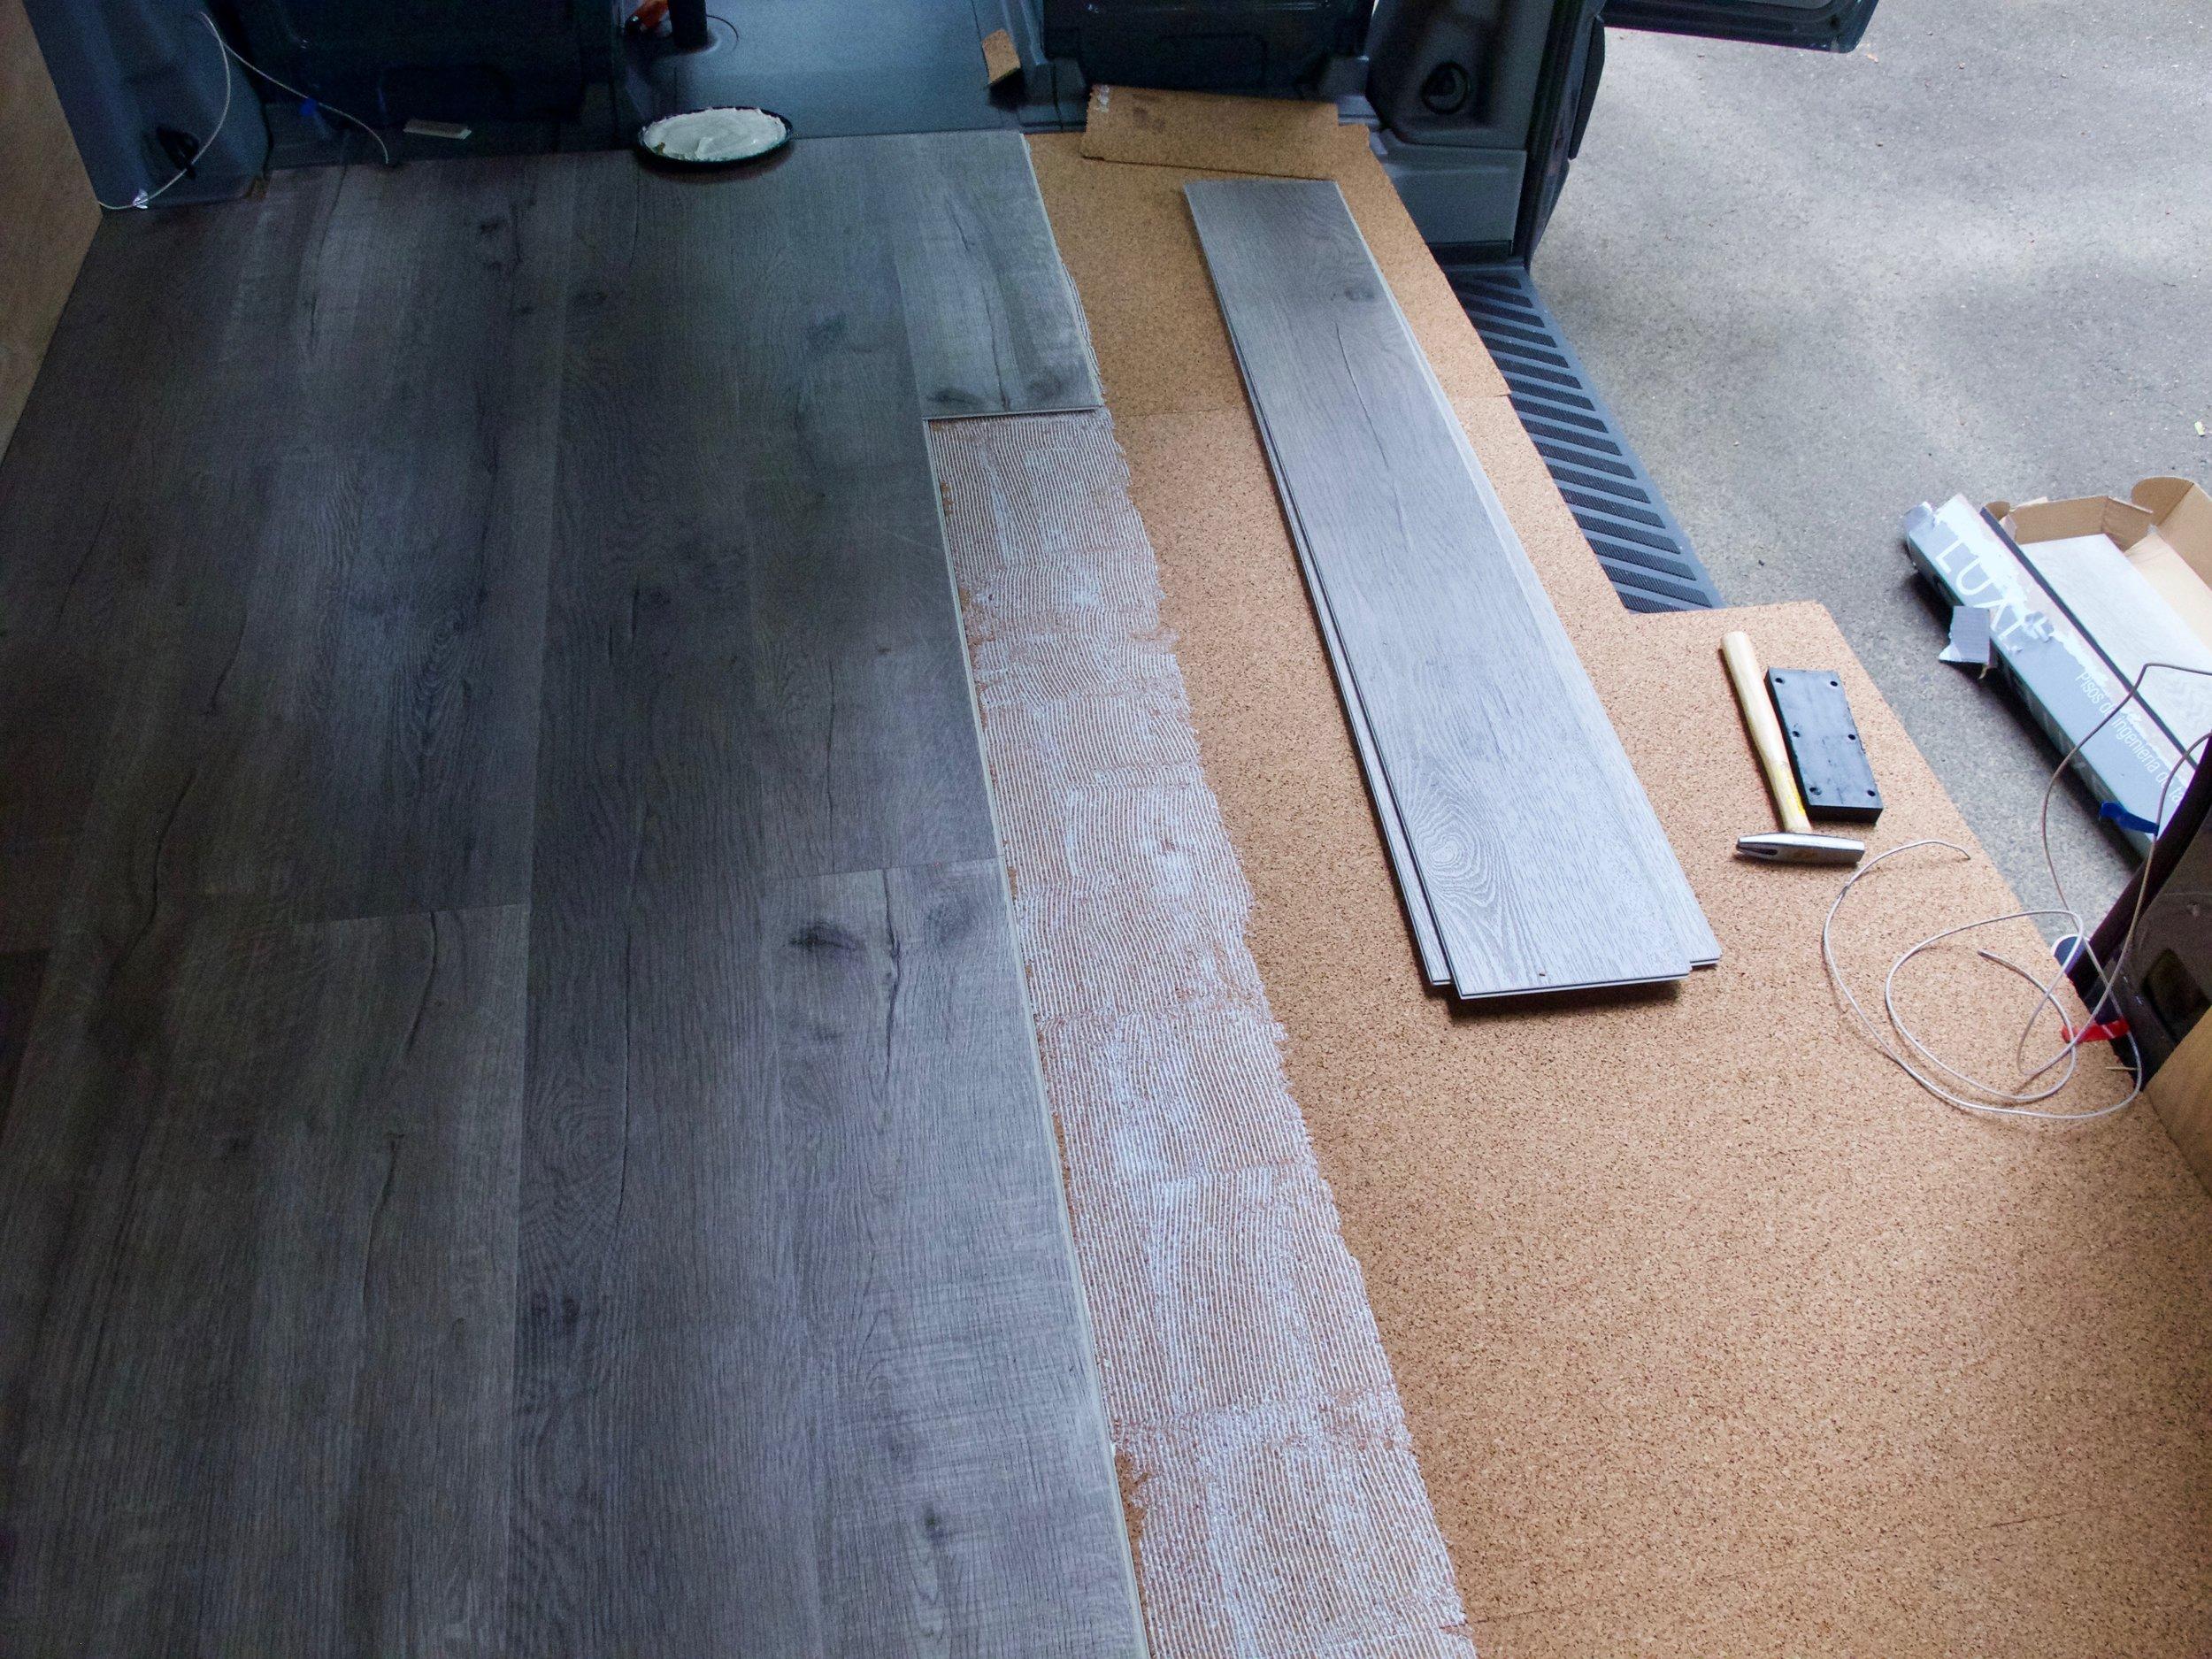 adhesive ready for flooring.jpg